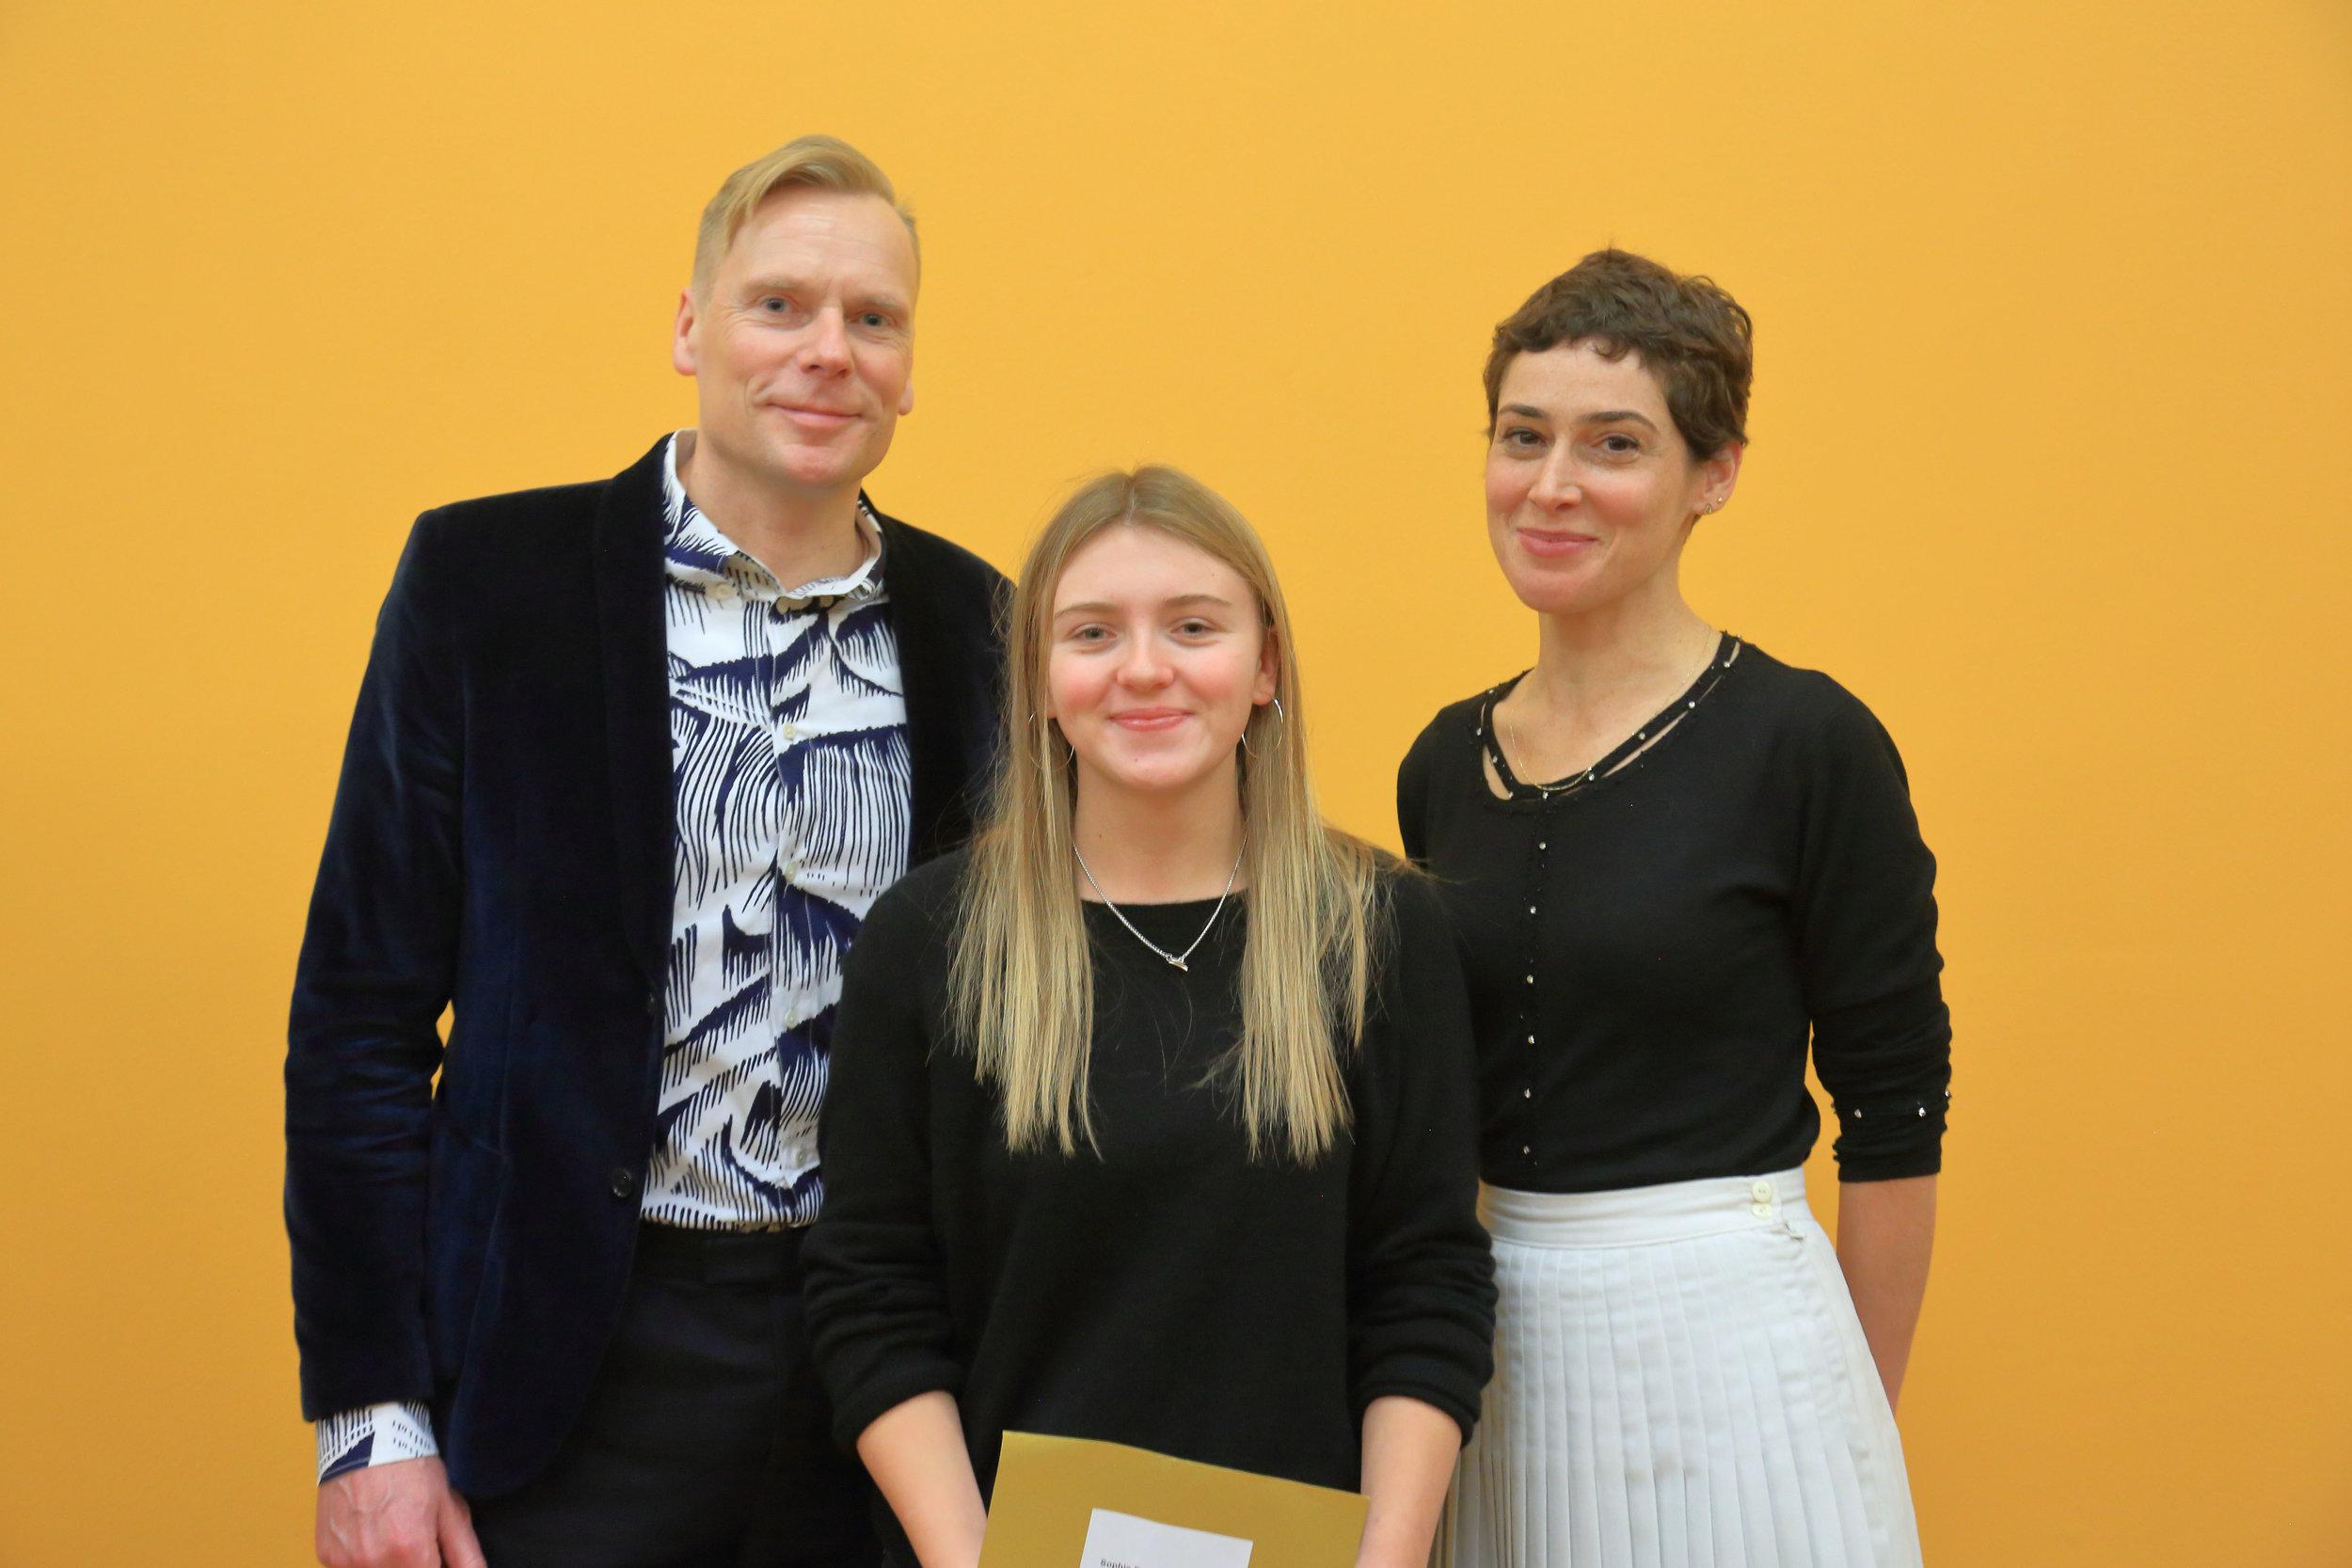 Director of Modern Art Oxford Paul Hobson with Platform Graduate Award 2017 Winner Sophie Barber and guest selector, Artist Rosalind Nashashibi.